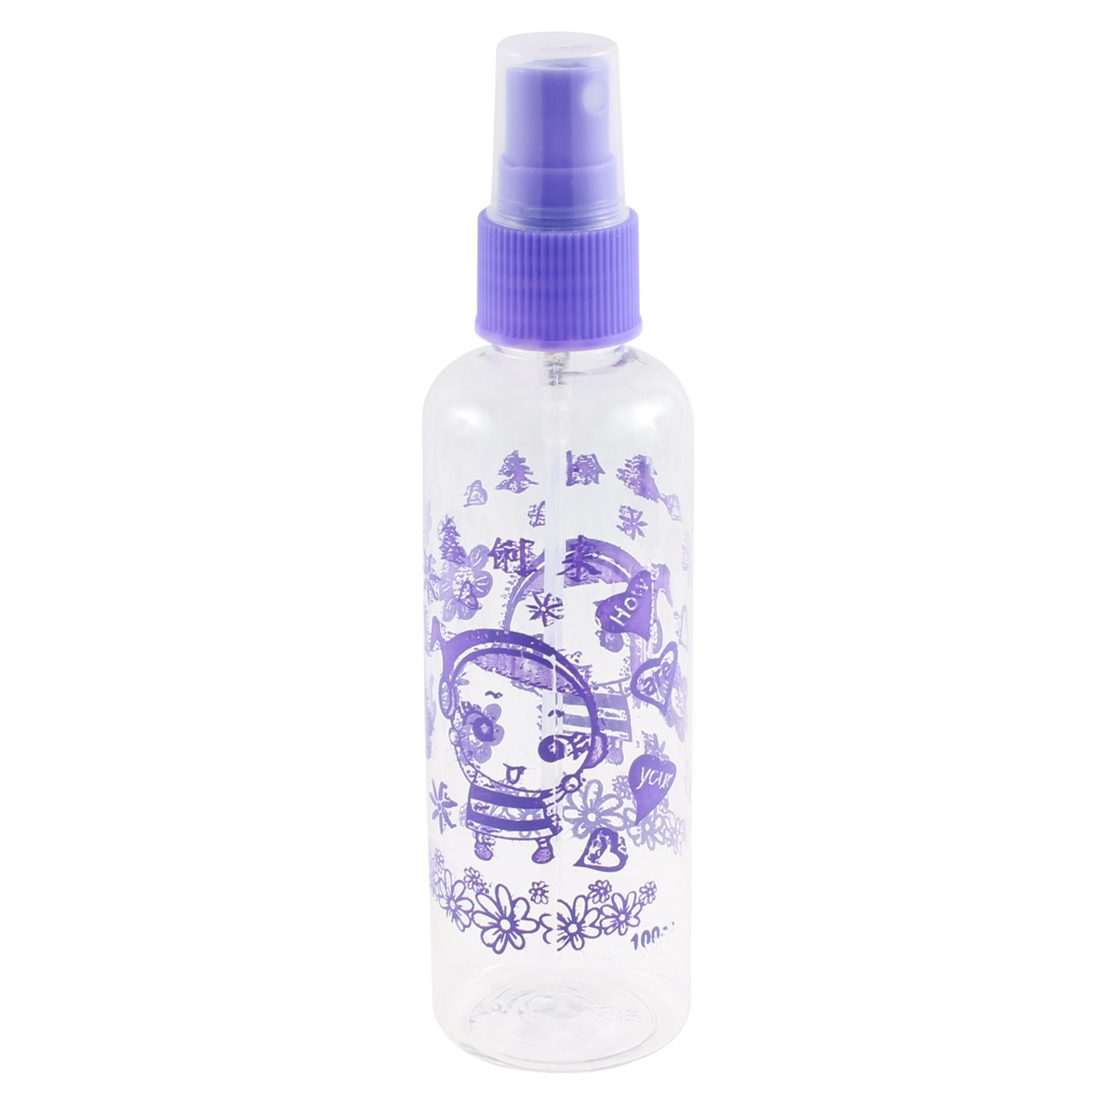 Plastic Portable Perfume Containers Spray Atomizer 100ml Empty Bottles Purple